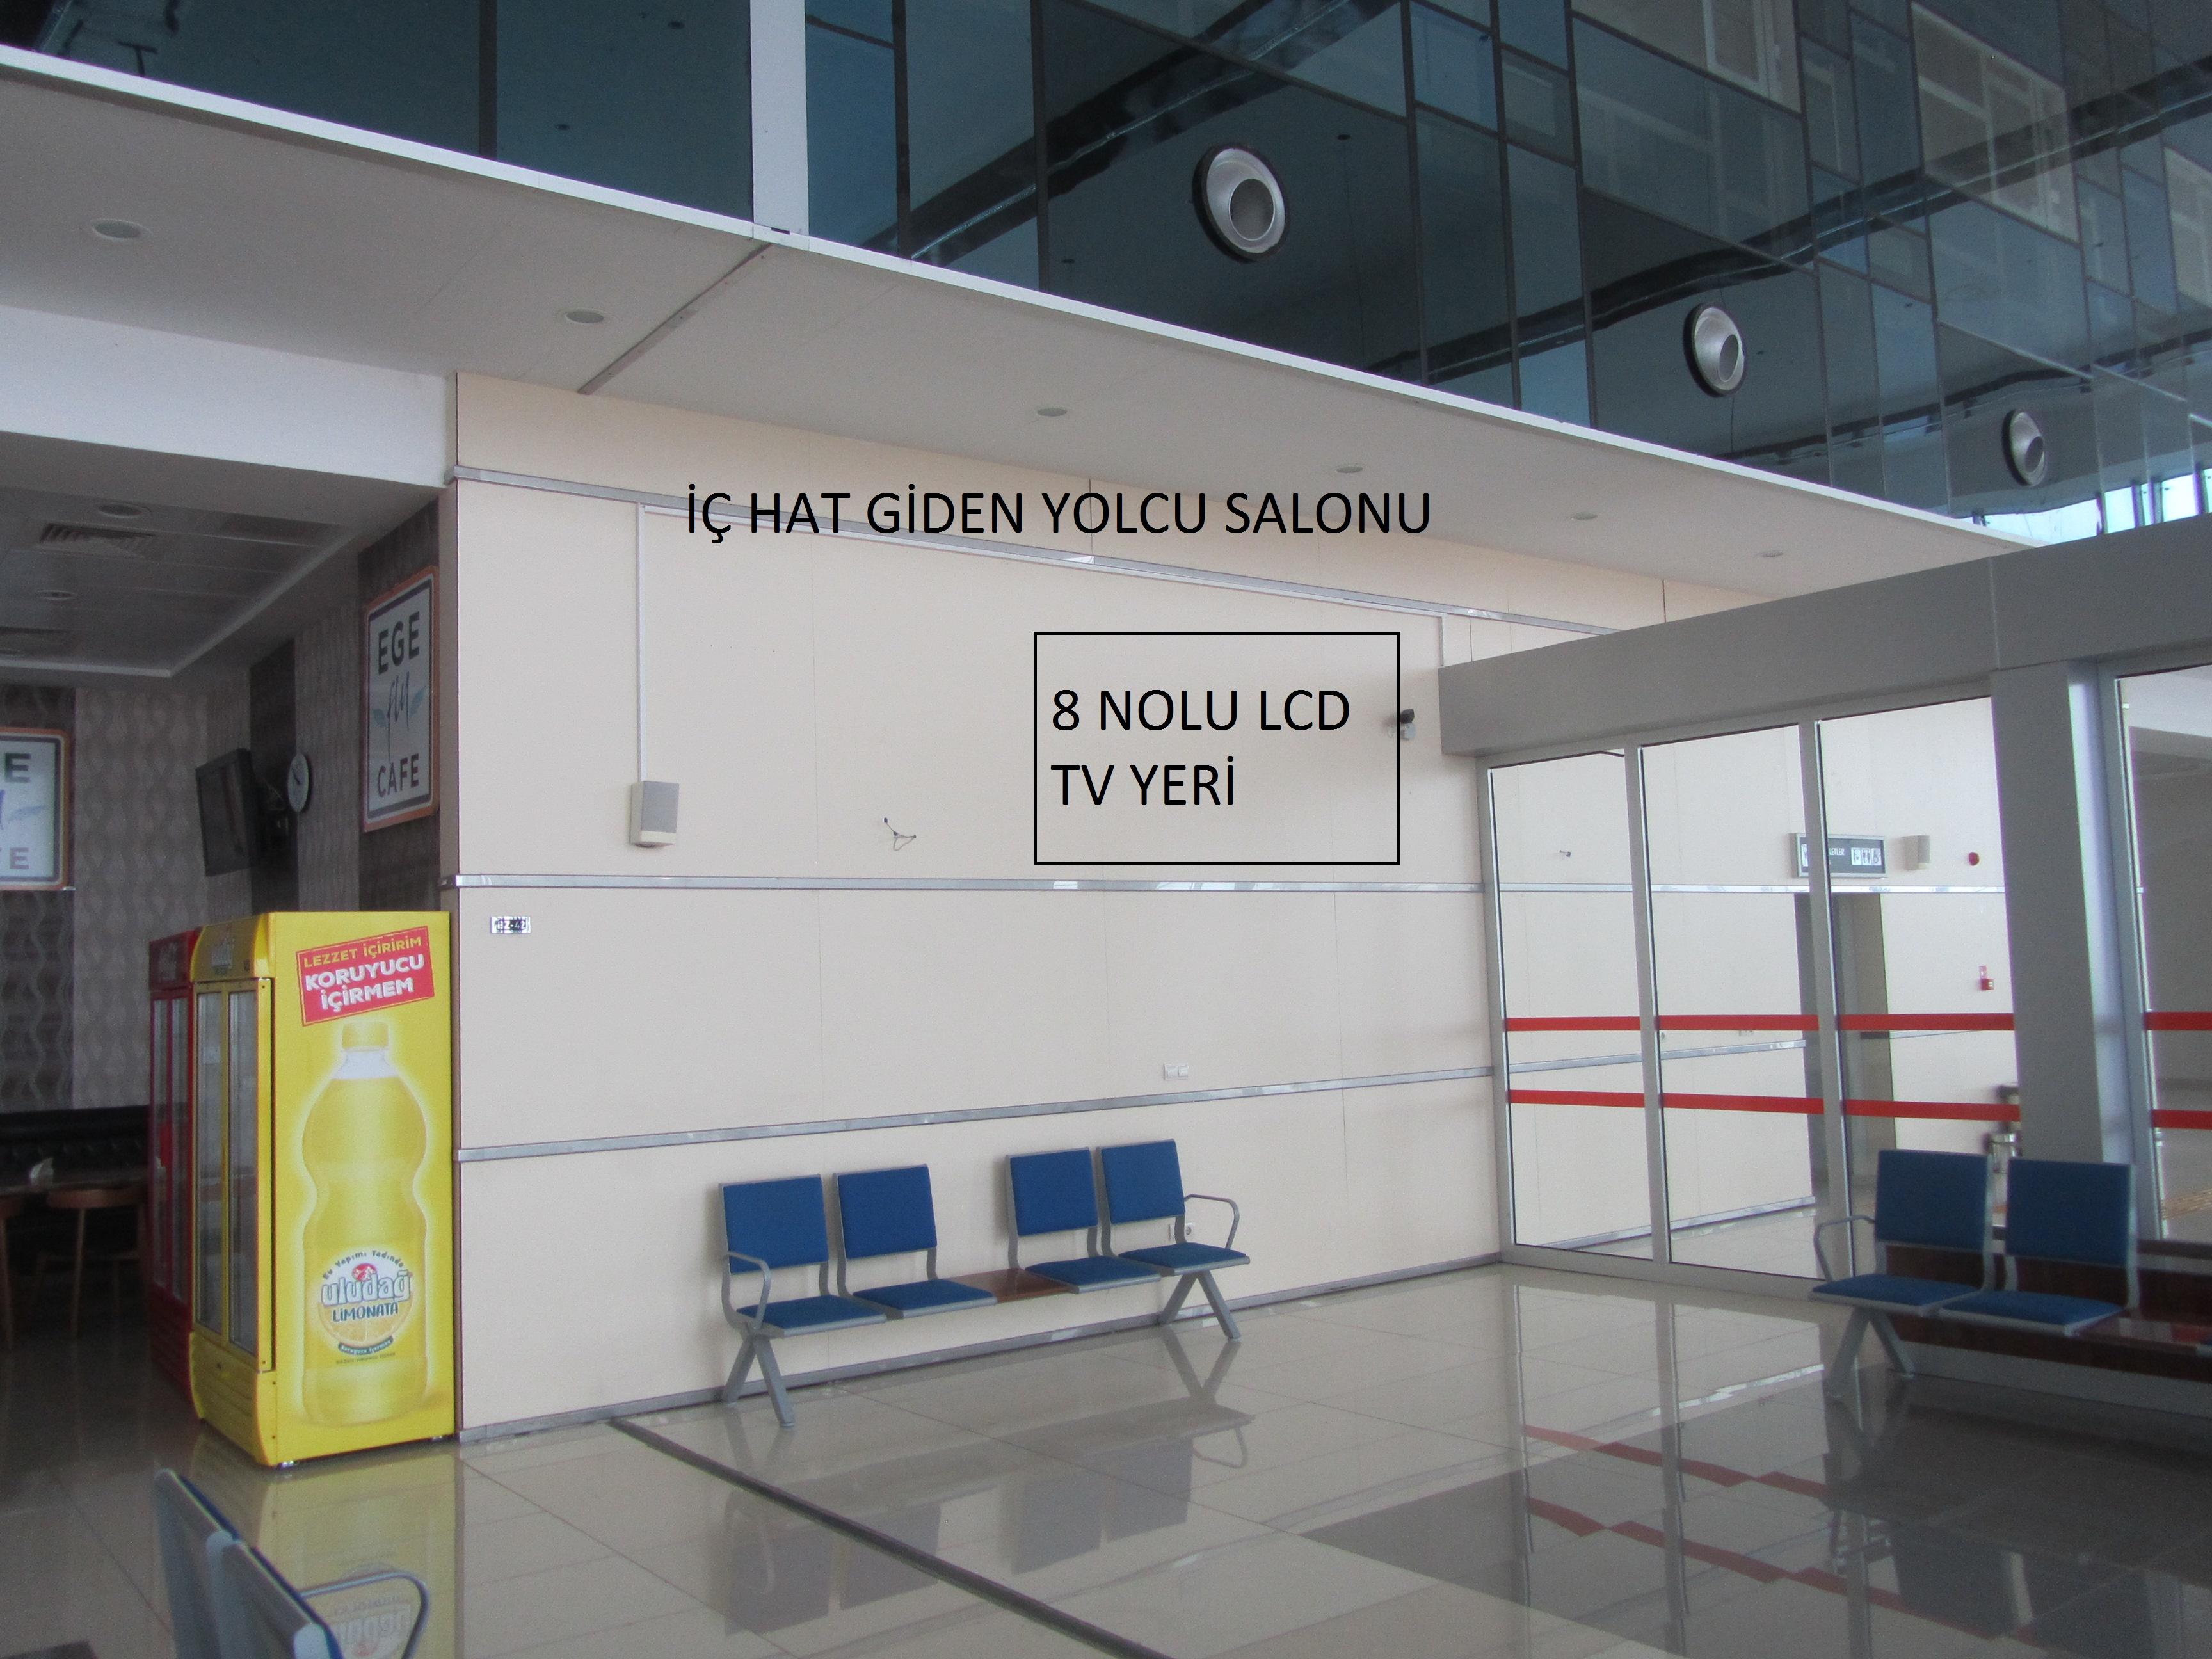 8 NOLU LCD TV.jpg